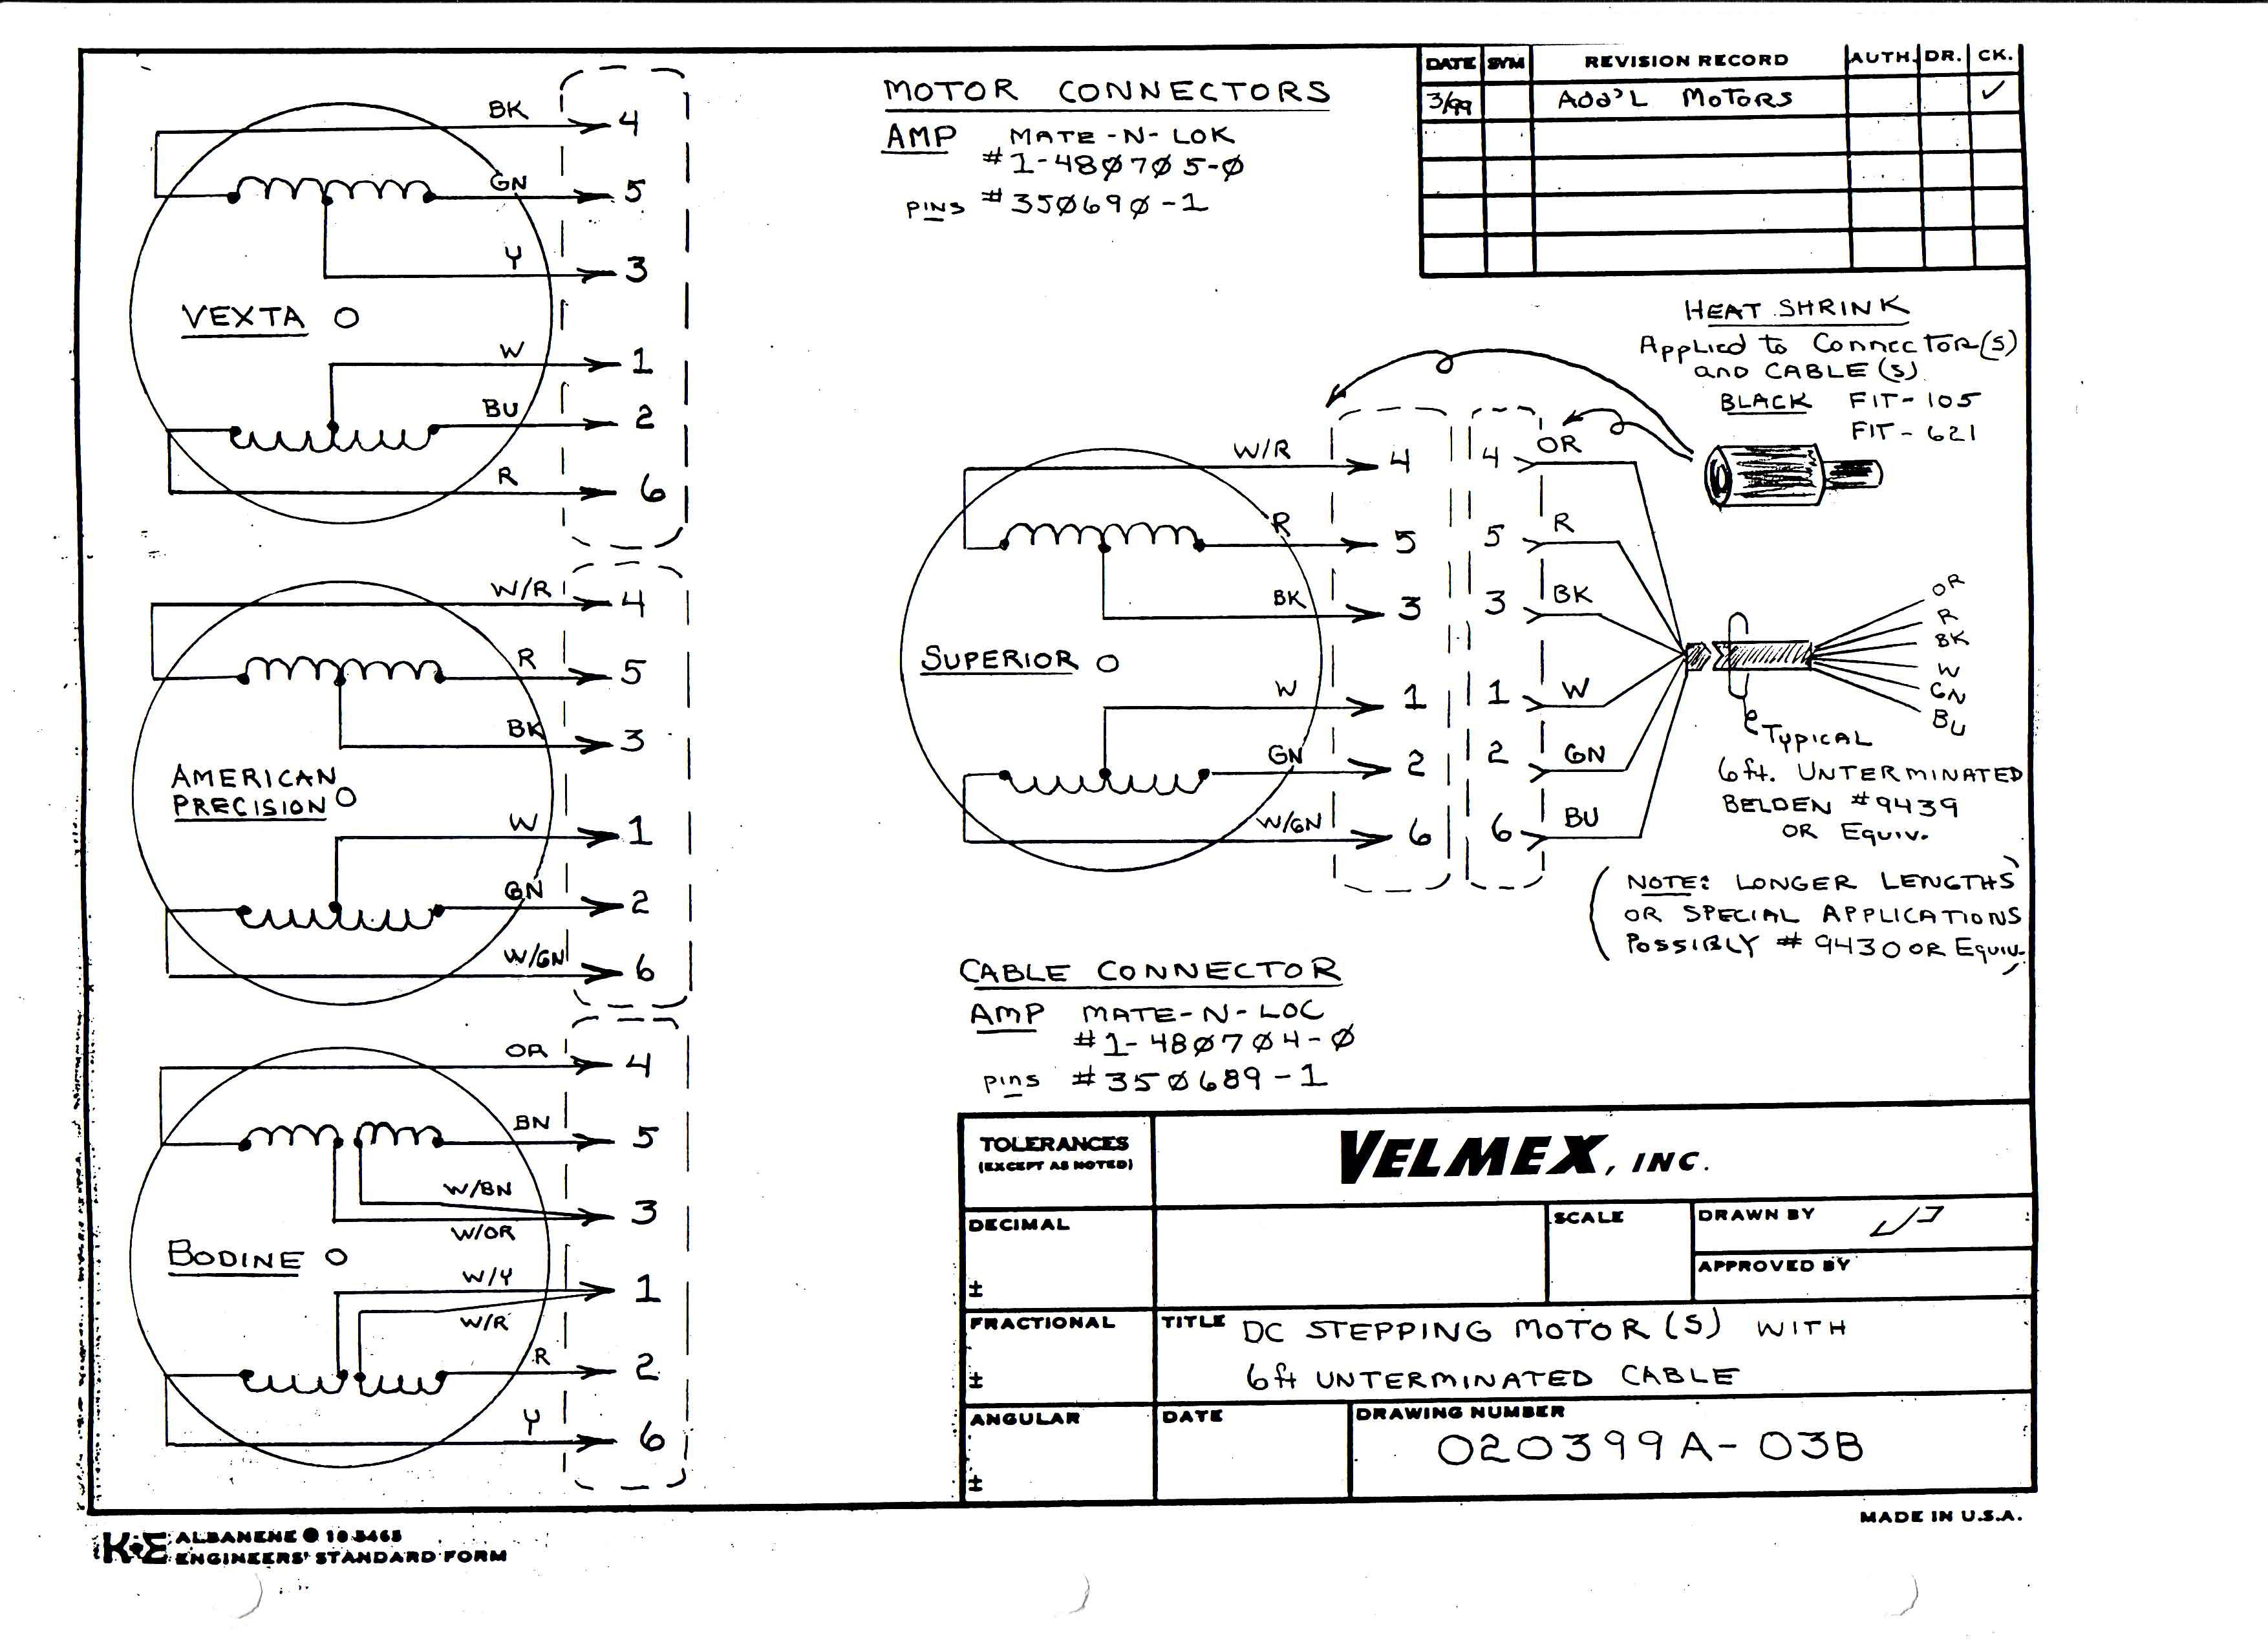 alpine iva d310 wiring diagram simple am receiver circuit velmex motor controllers vxm